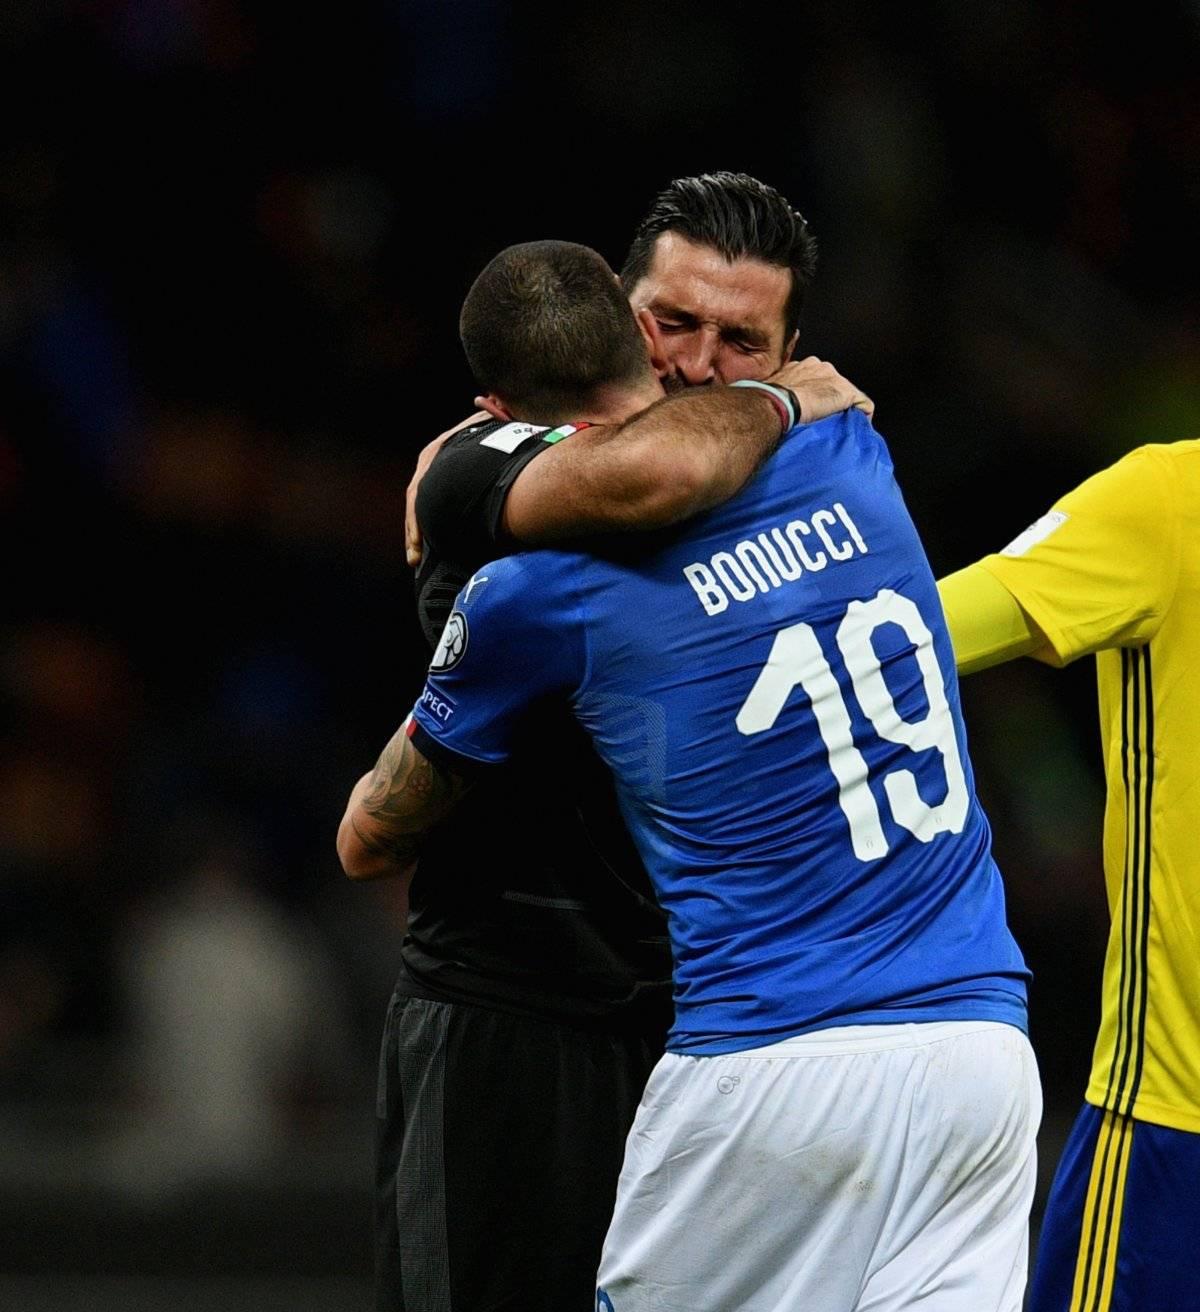 Italia llora no estar en Rusia 2018 / imagen: Getty Images